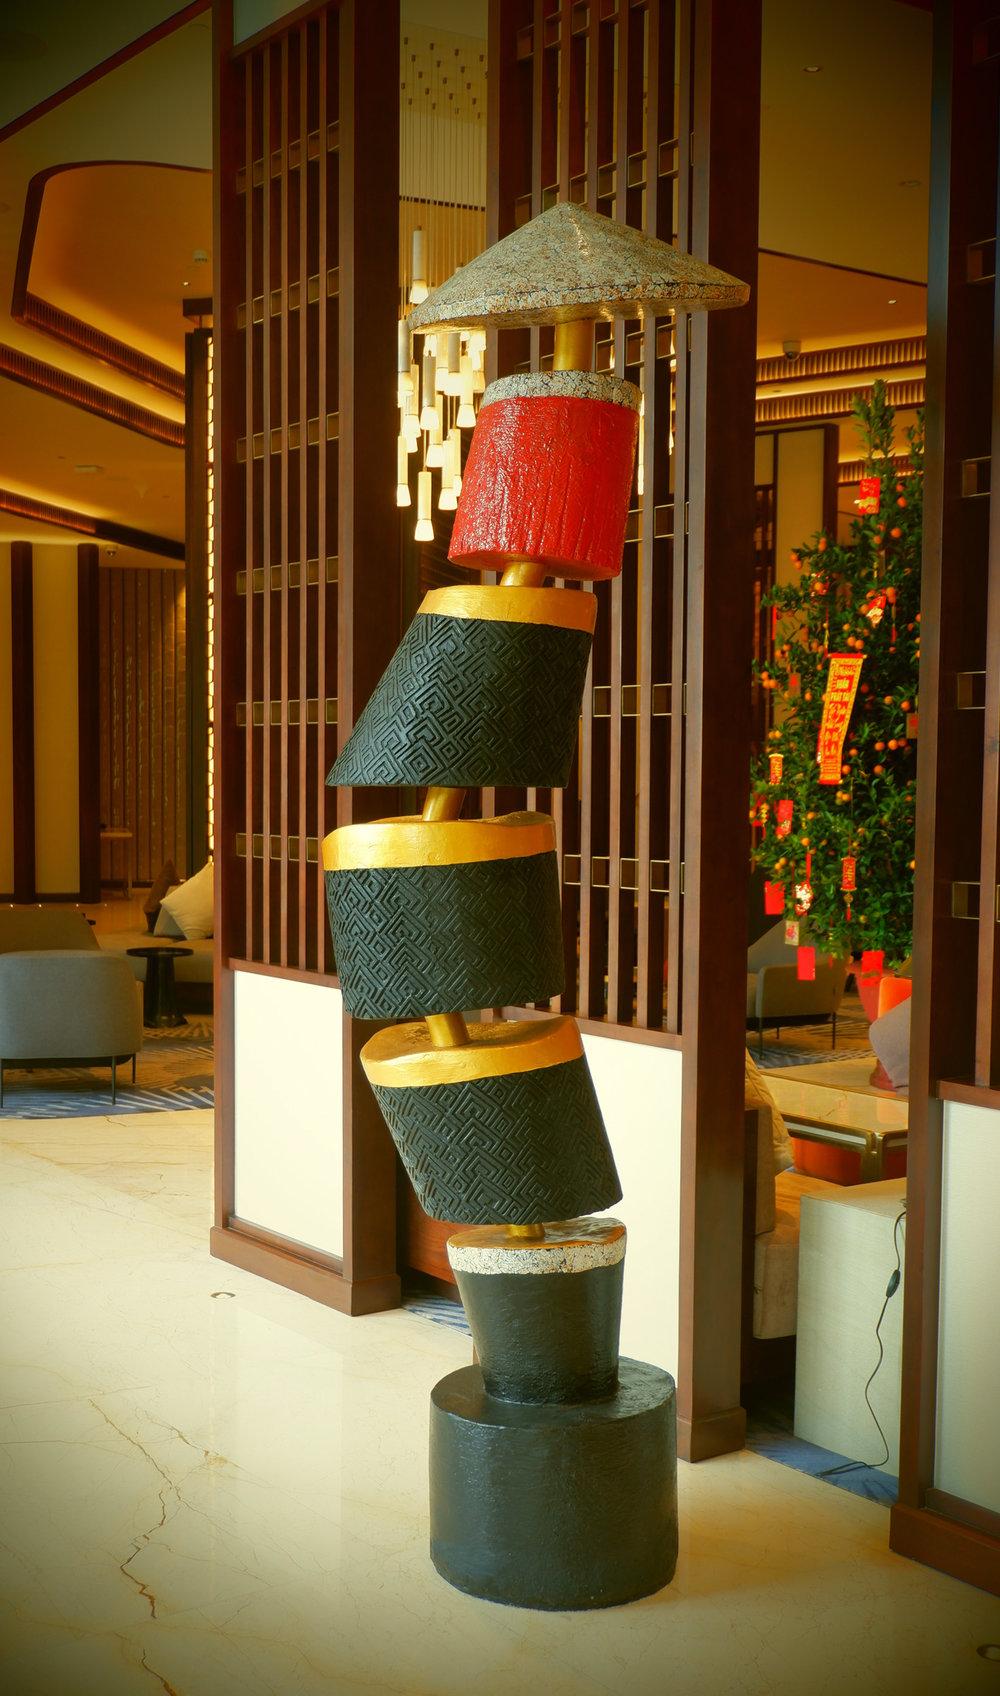 Hilton Danang Lobby Sculpture by Hay Hay